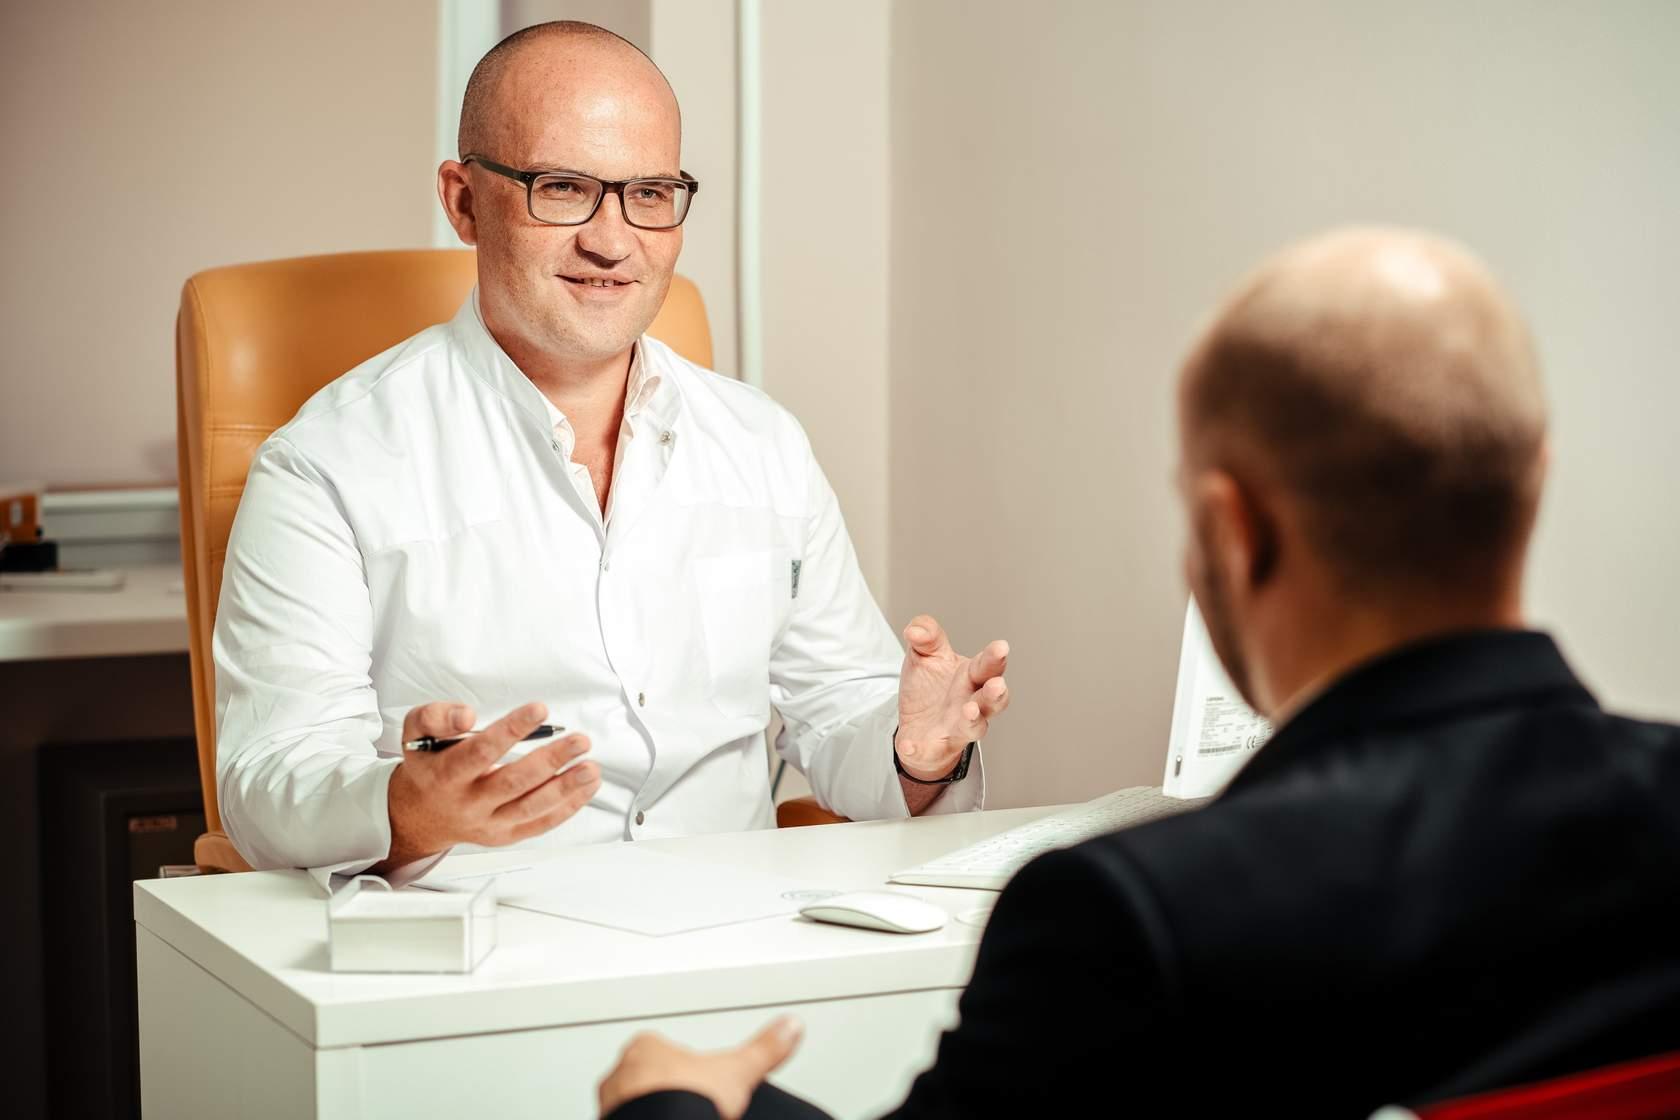 GP having conversation with patient